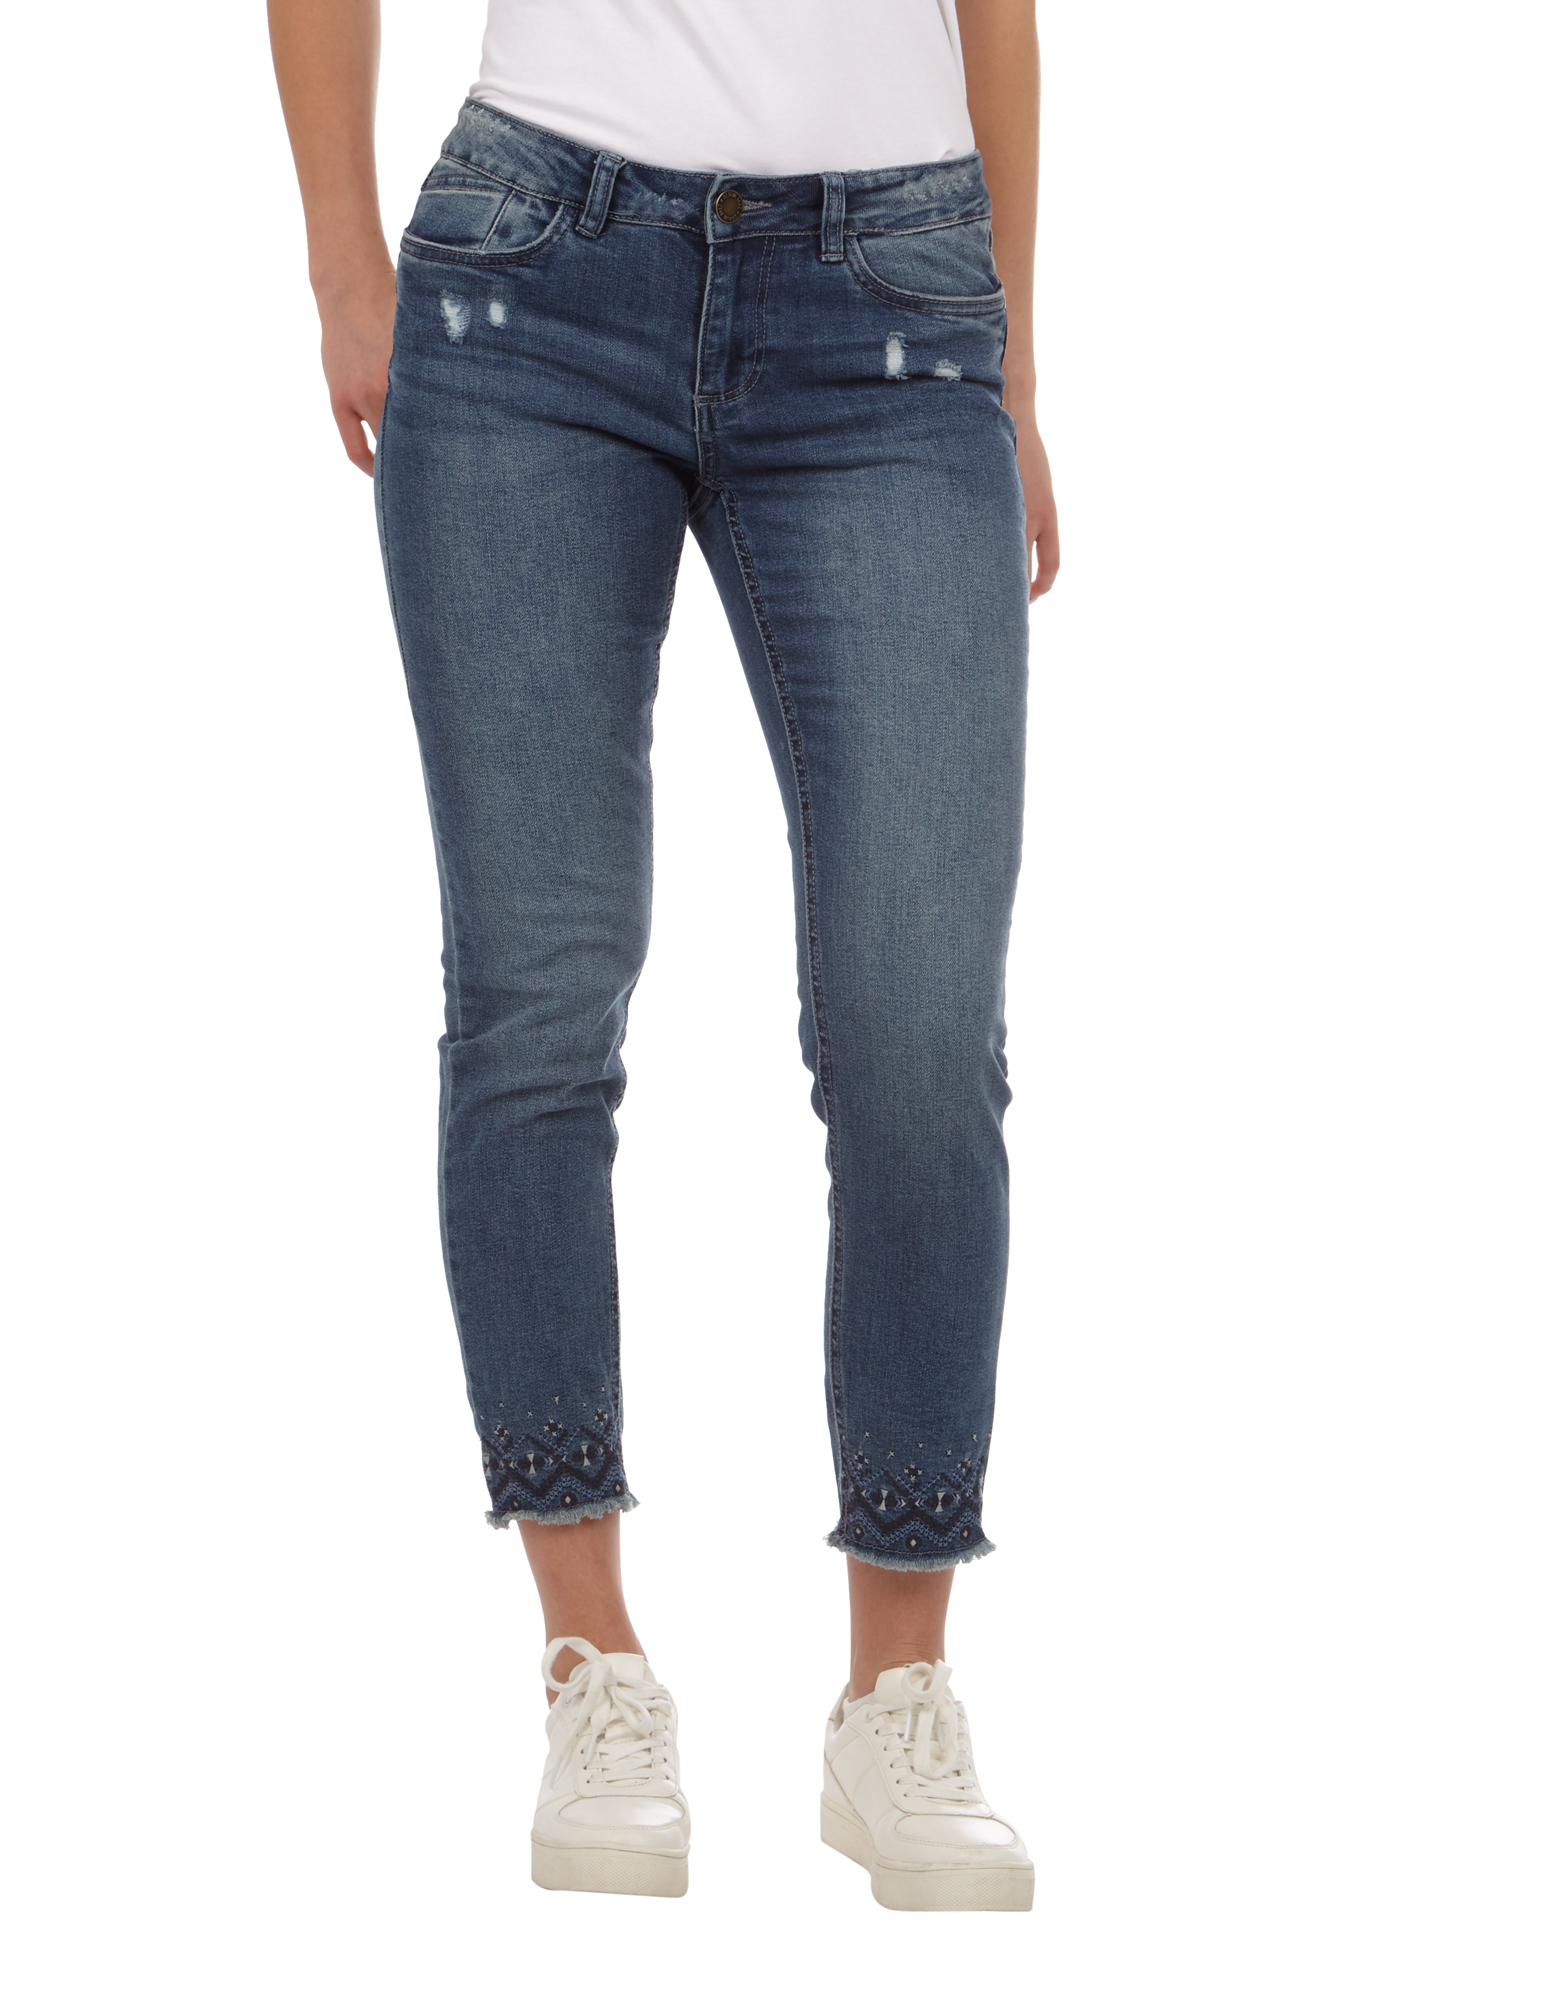 damen skinny fit jeans im used look takko fashion. Black Bedroom Furniture Sets. Home Design Ideas